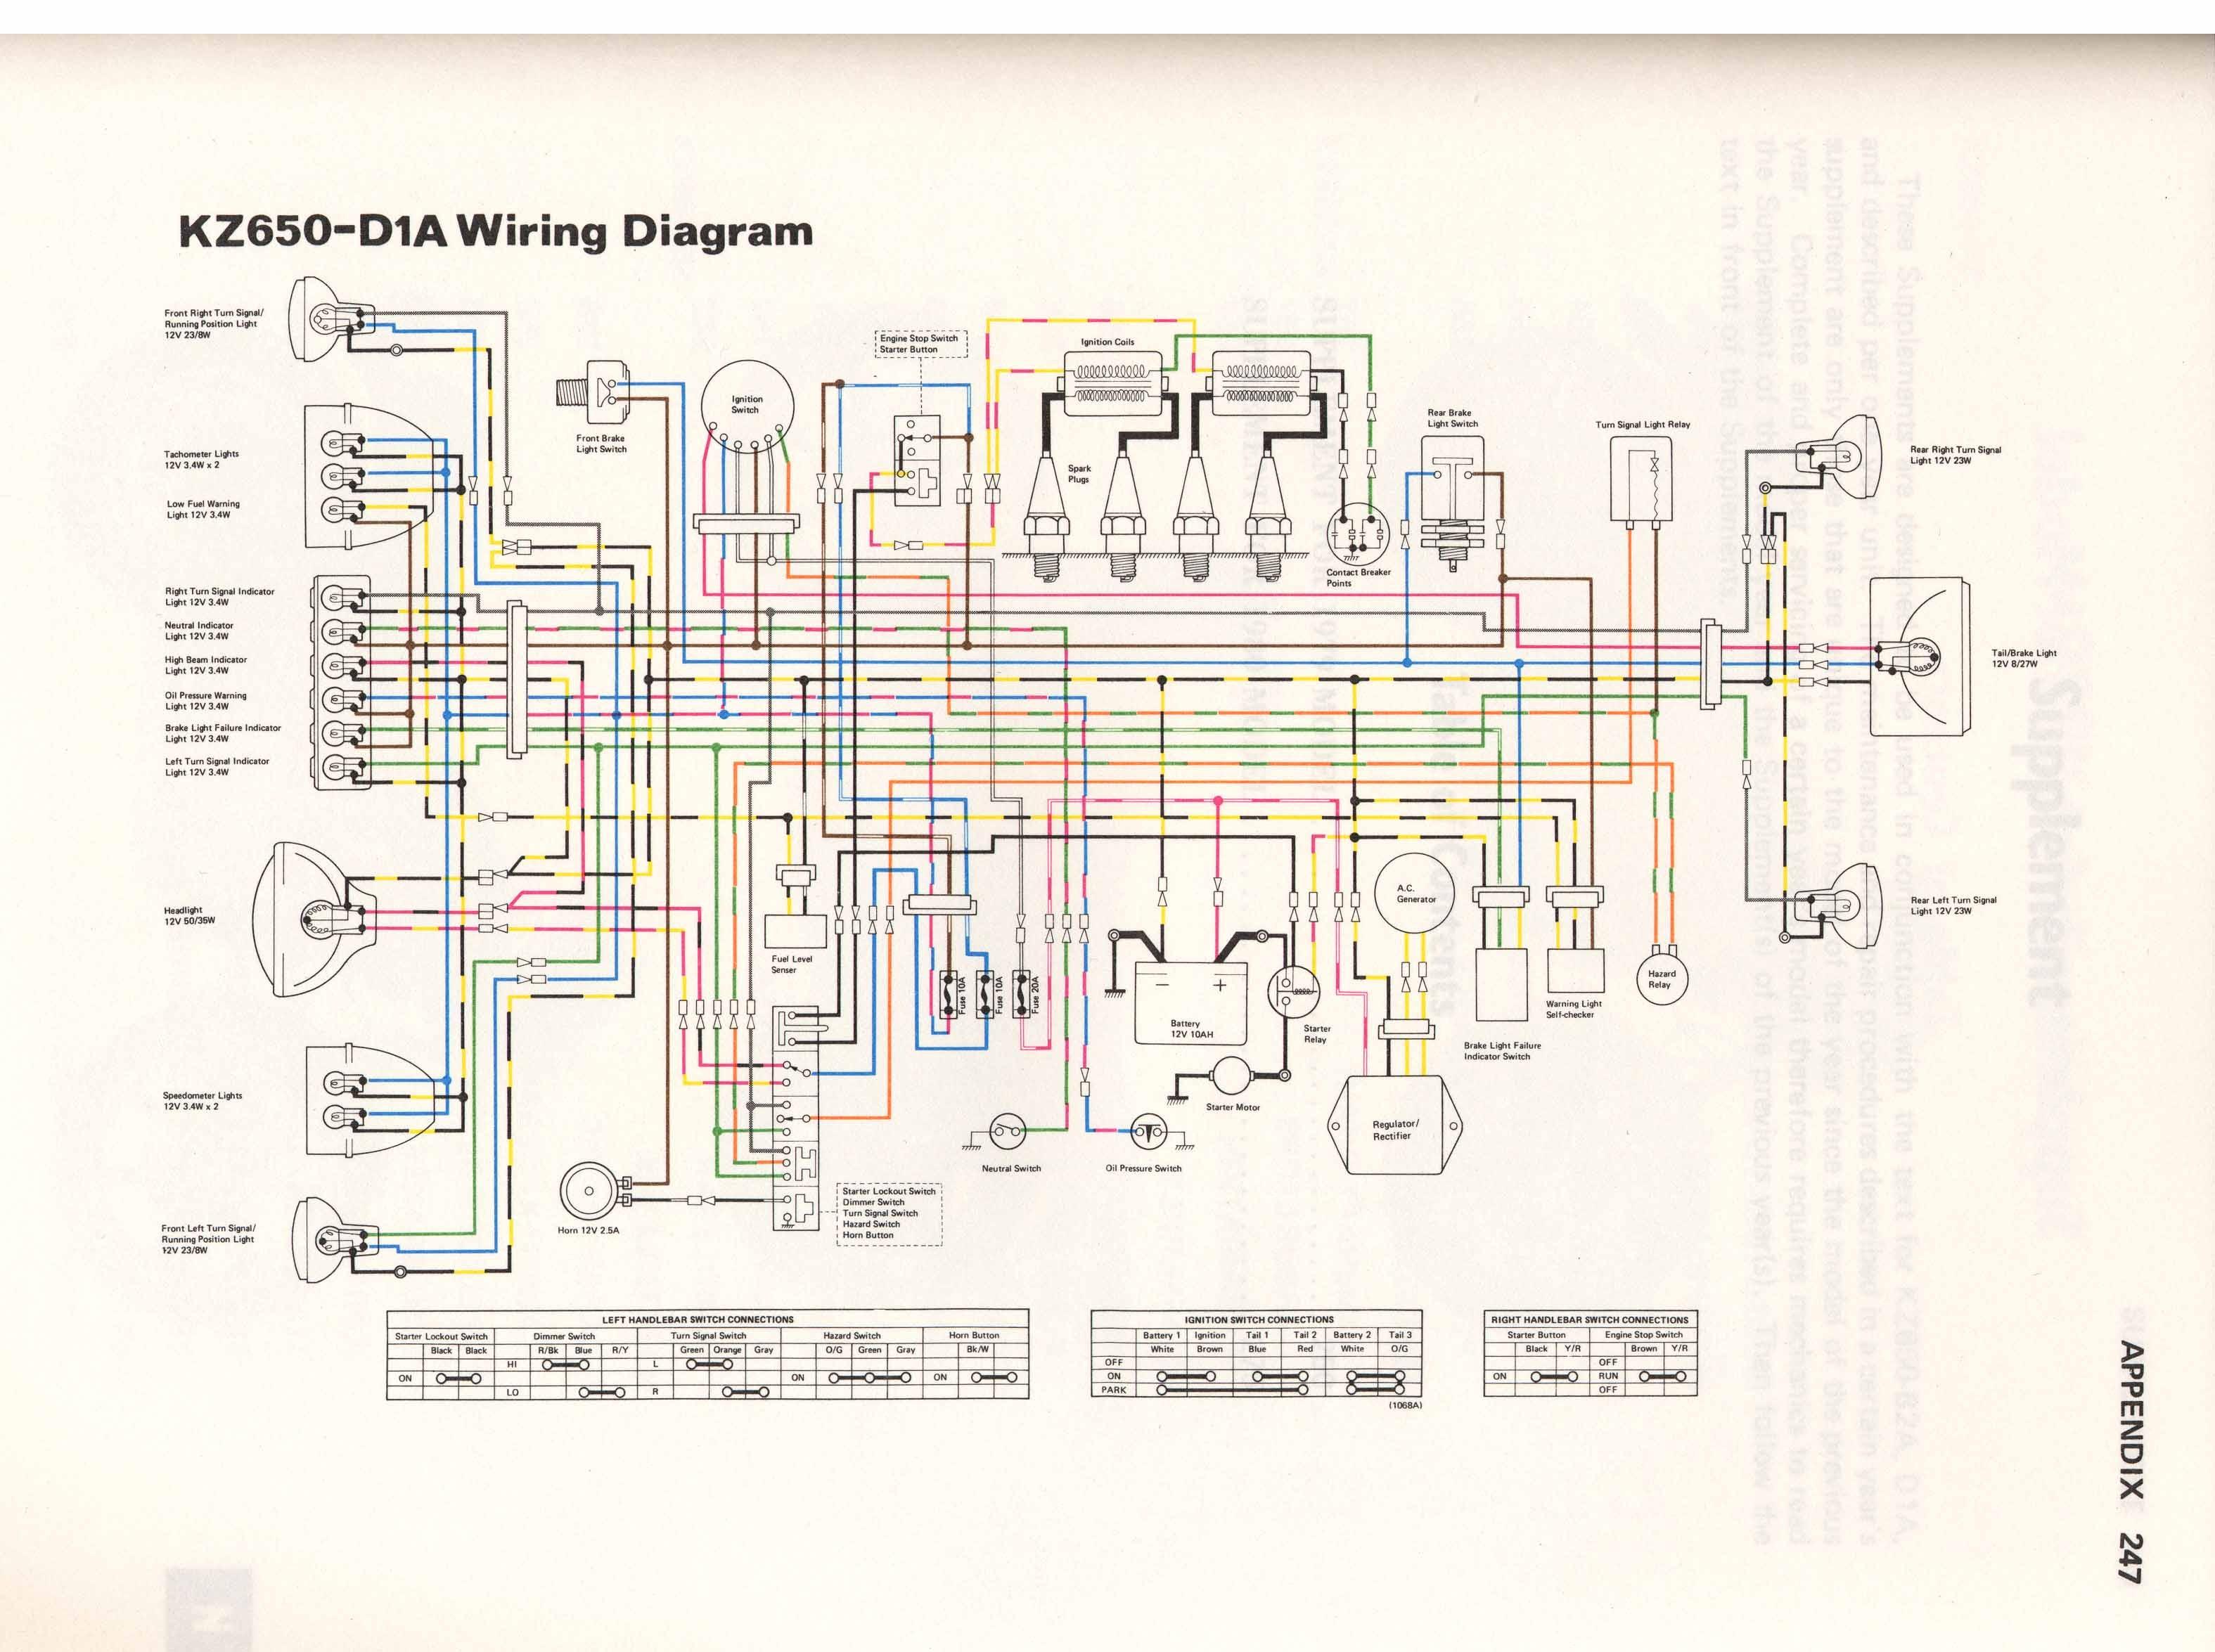 1982 Kawasaki Kz1300 Wiring Diagrams Electrical Diagram 1978 750 Well Detailed U2022 Inviter